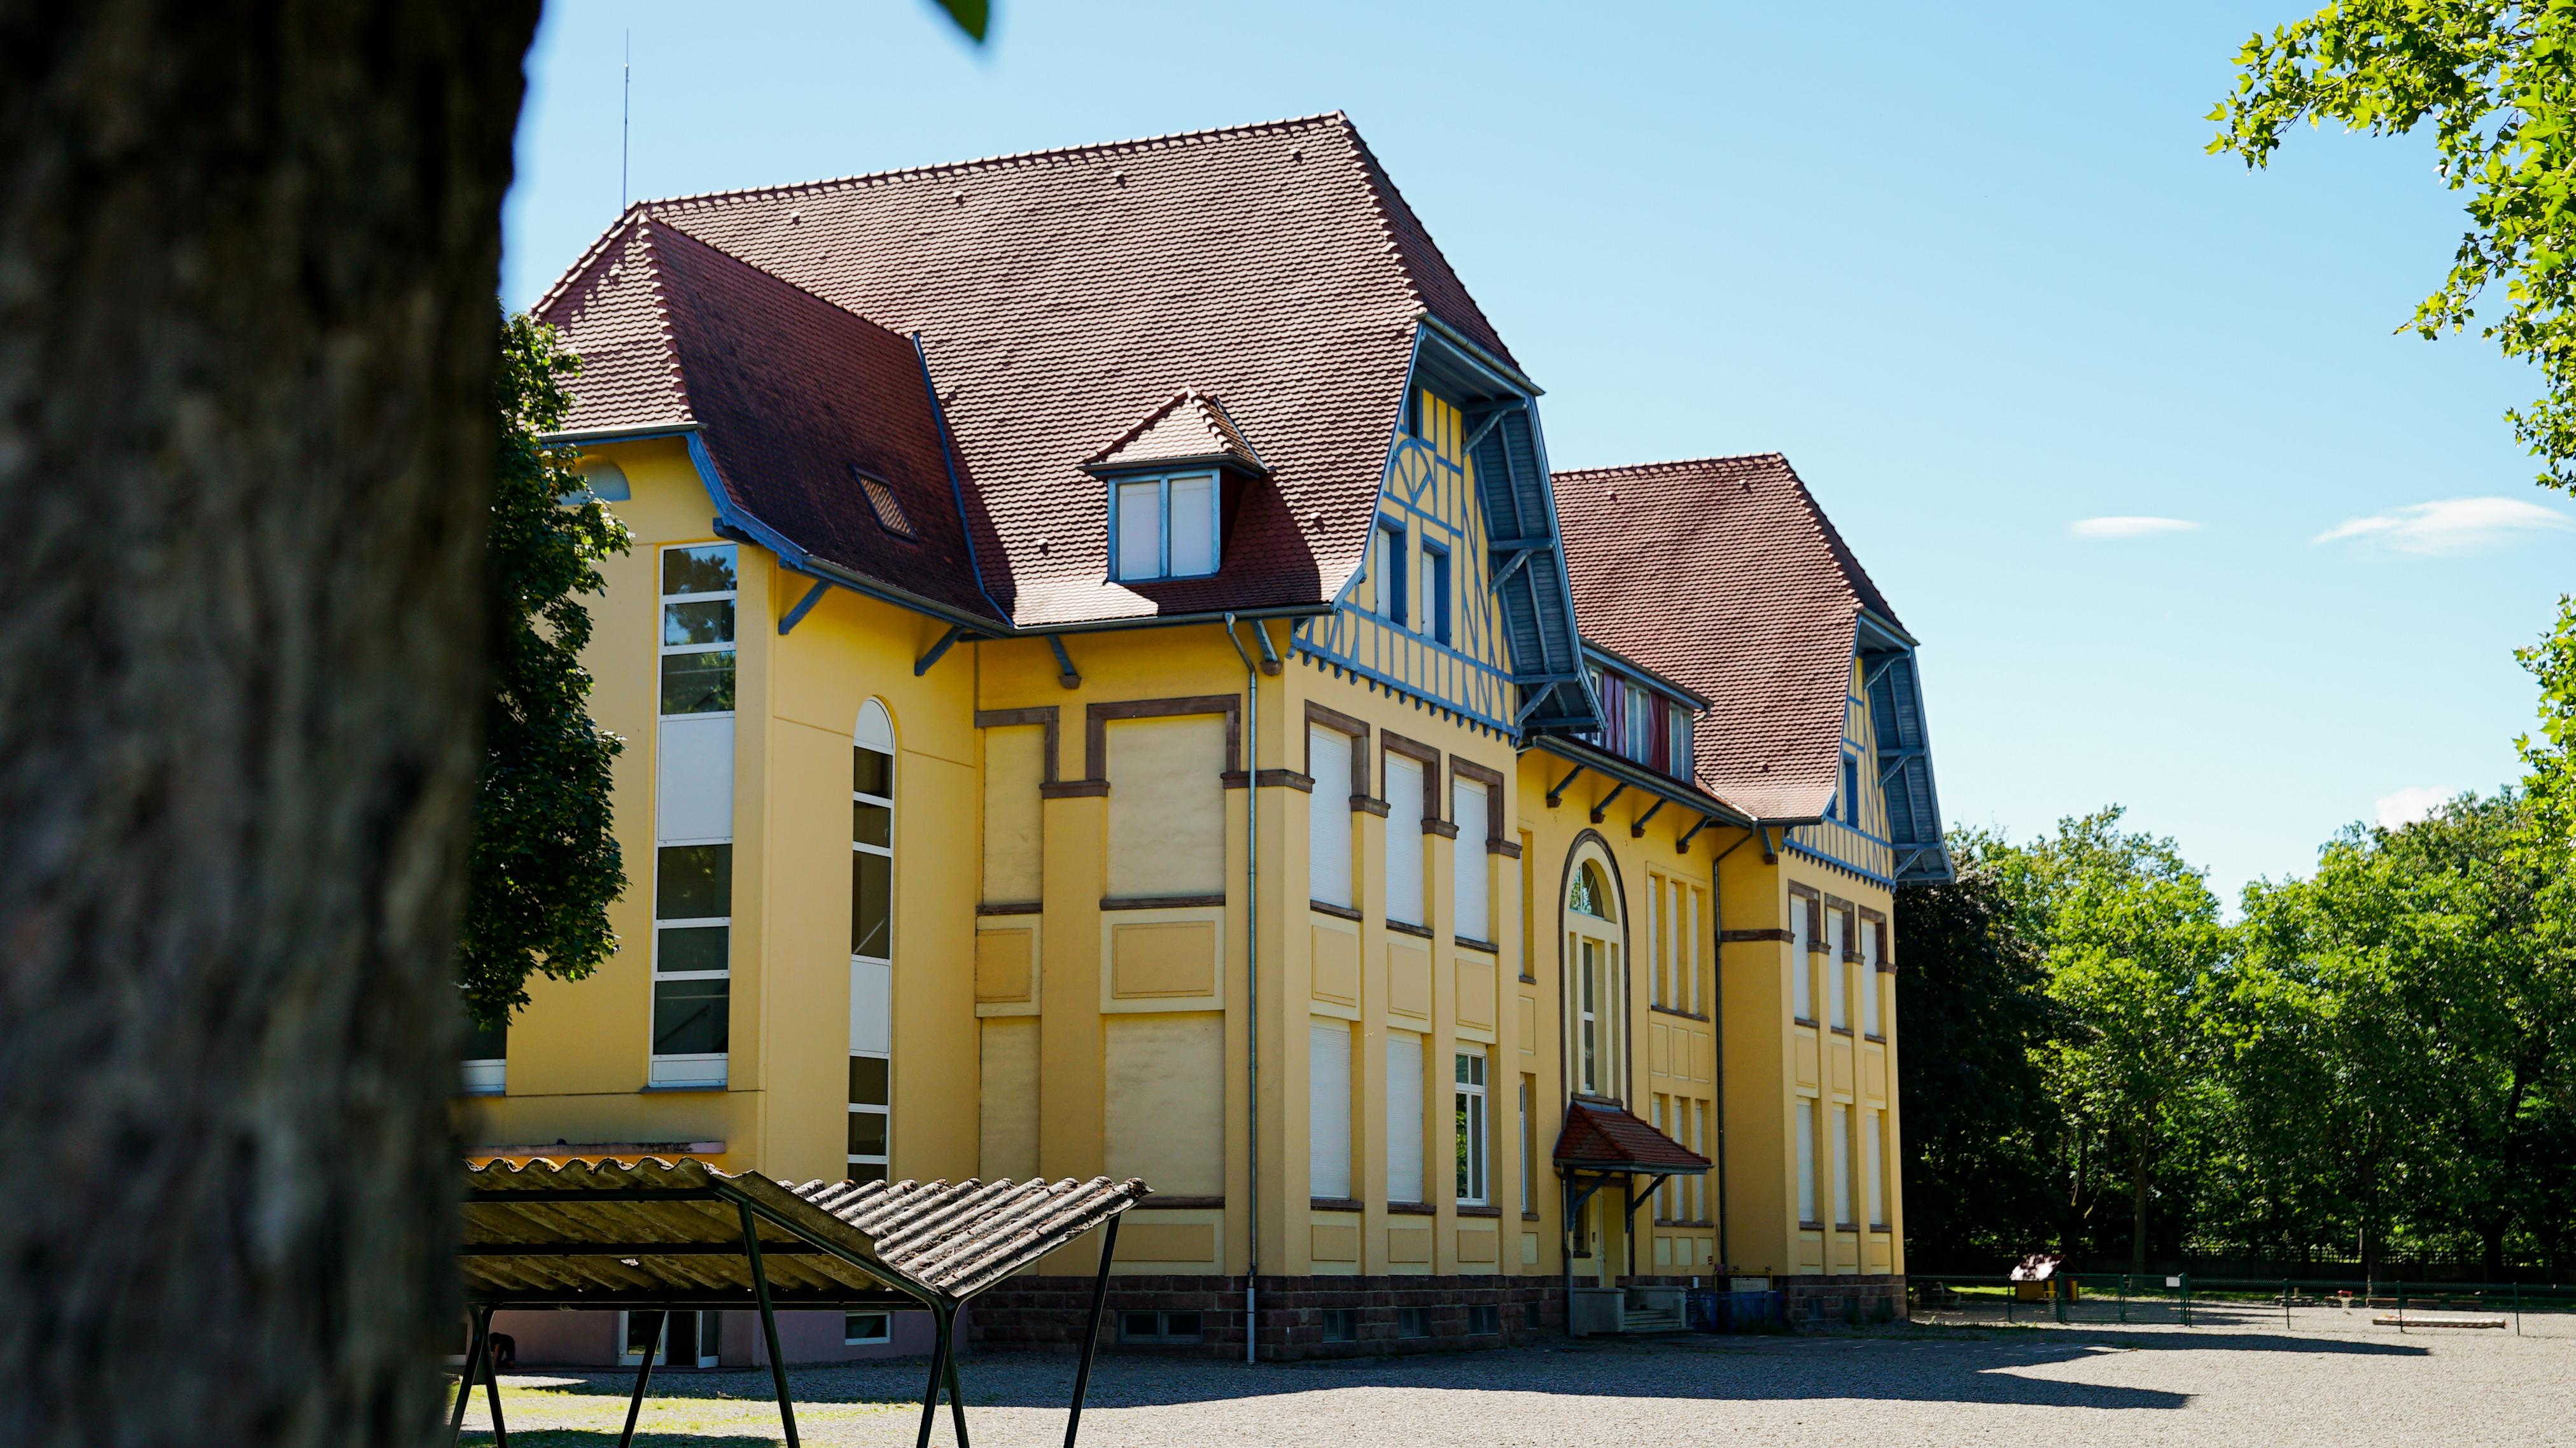 Graffenwald groupe scolaire